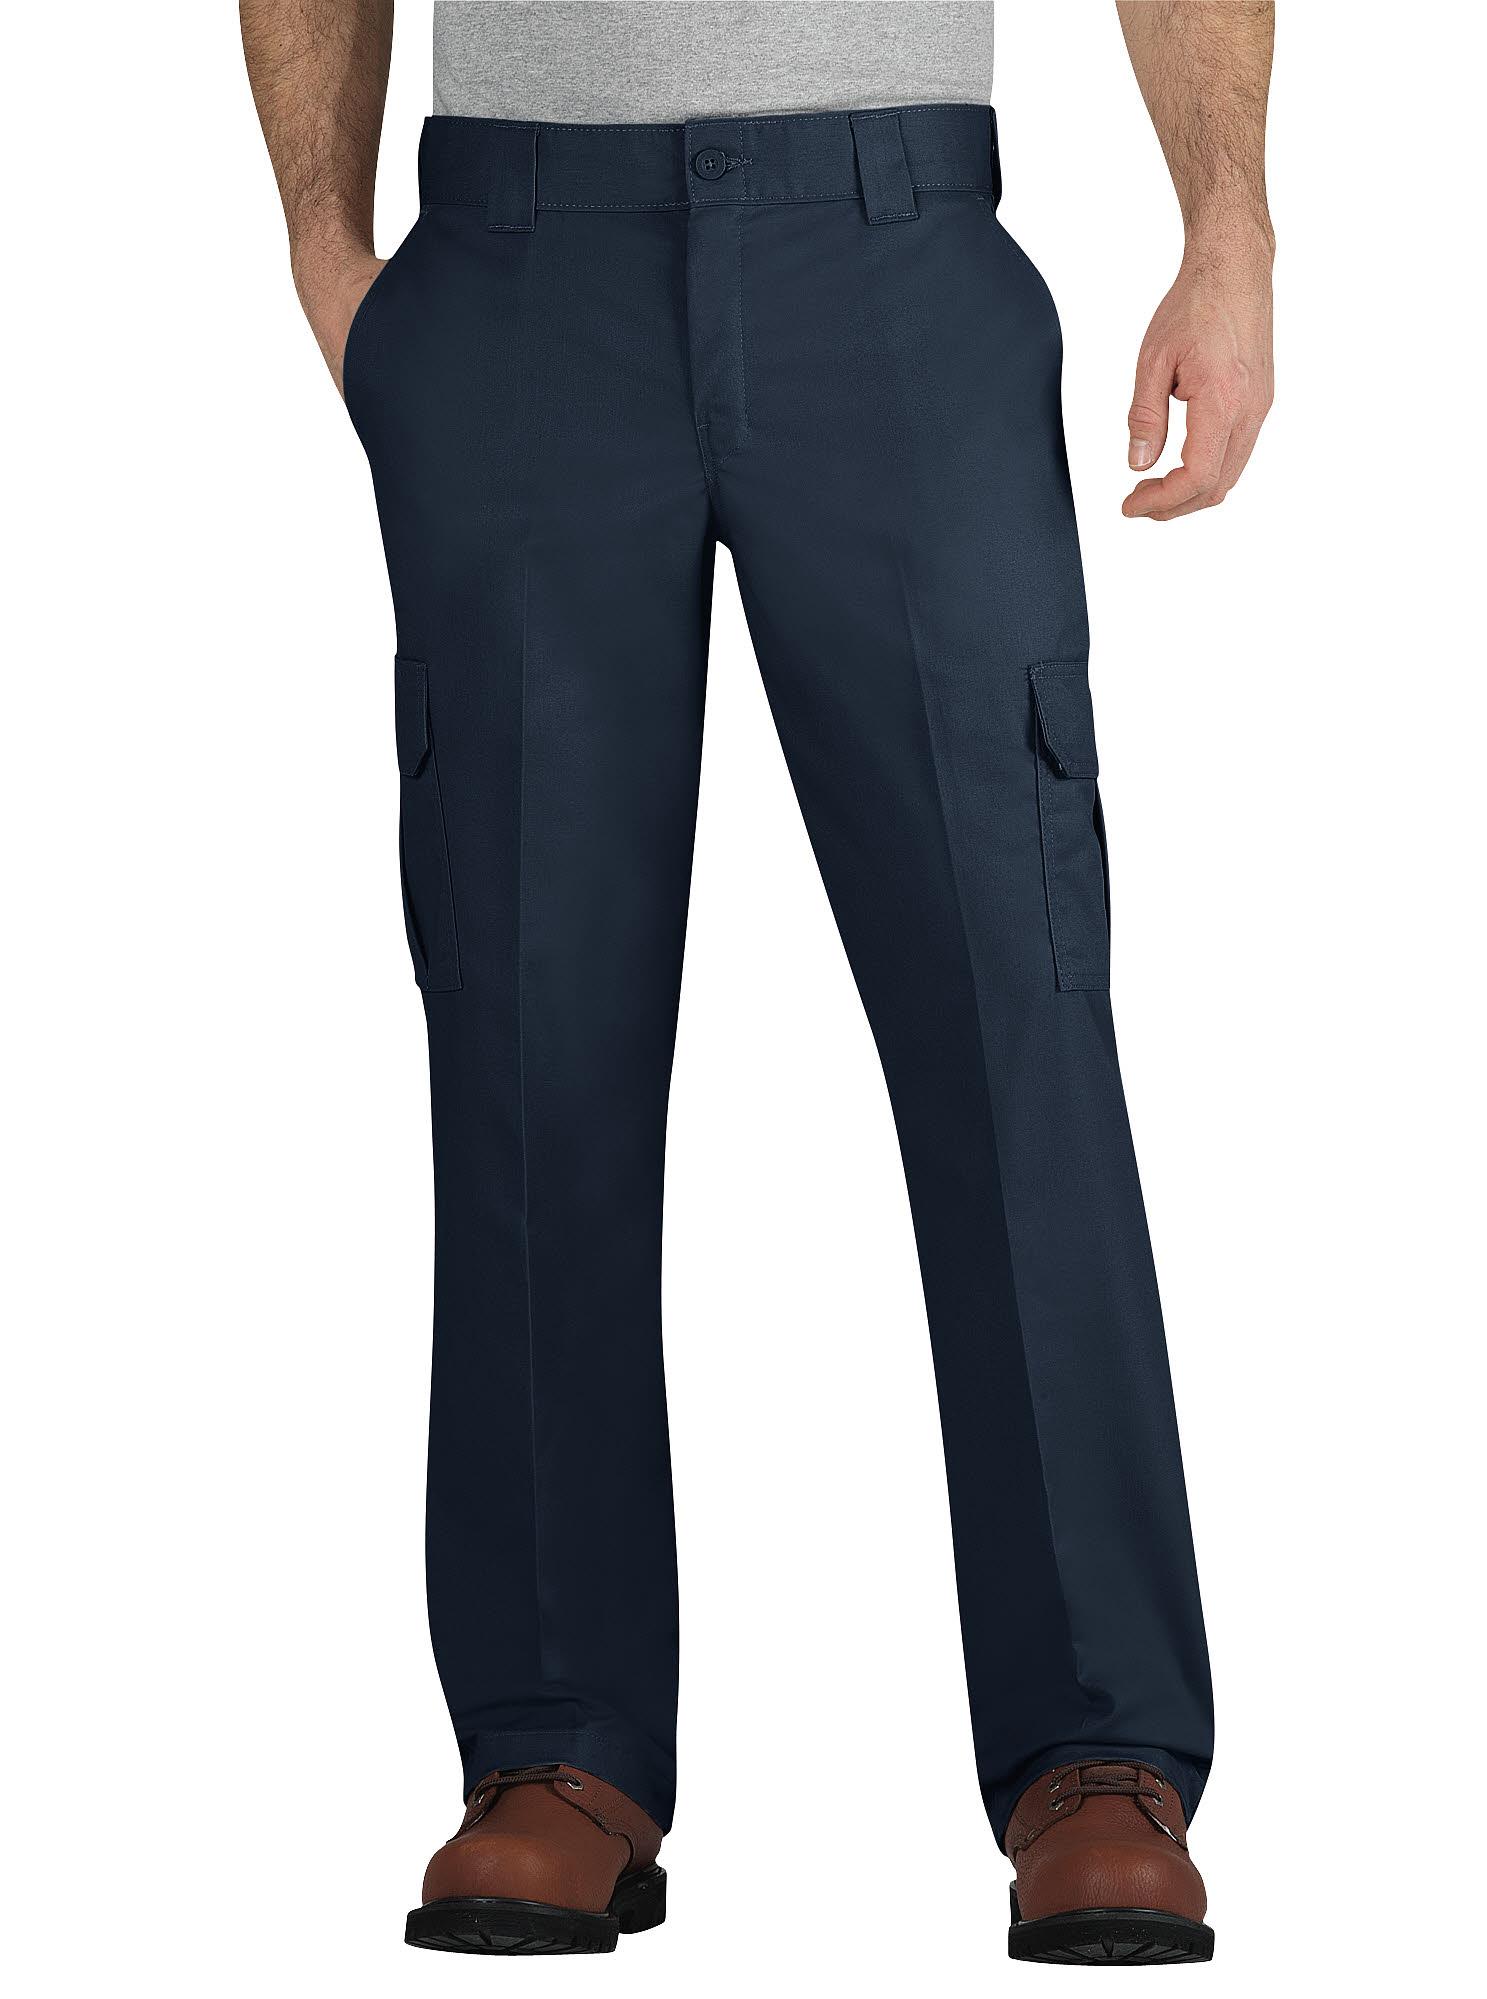 Dickies Regular Fit, Straight Leg Twill Cargo Pant WP595DN